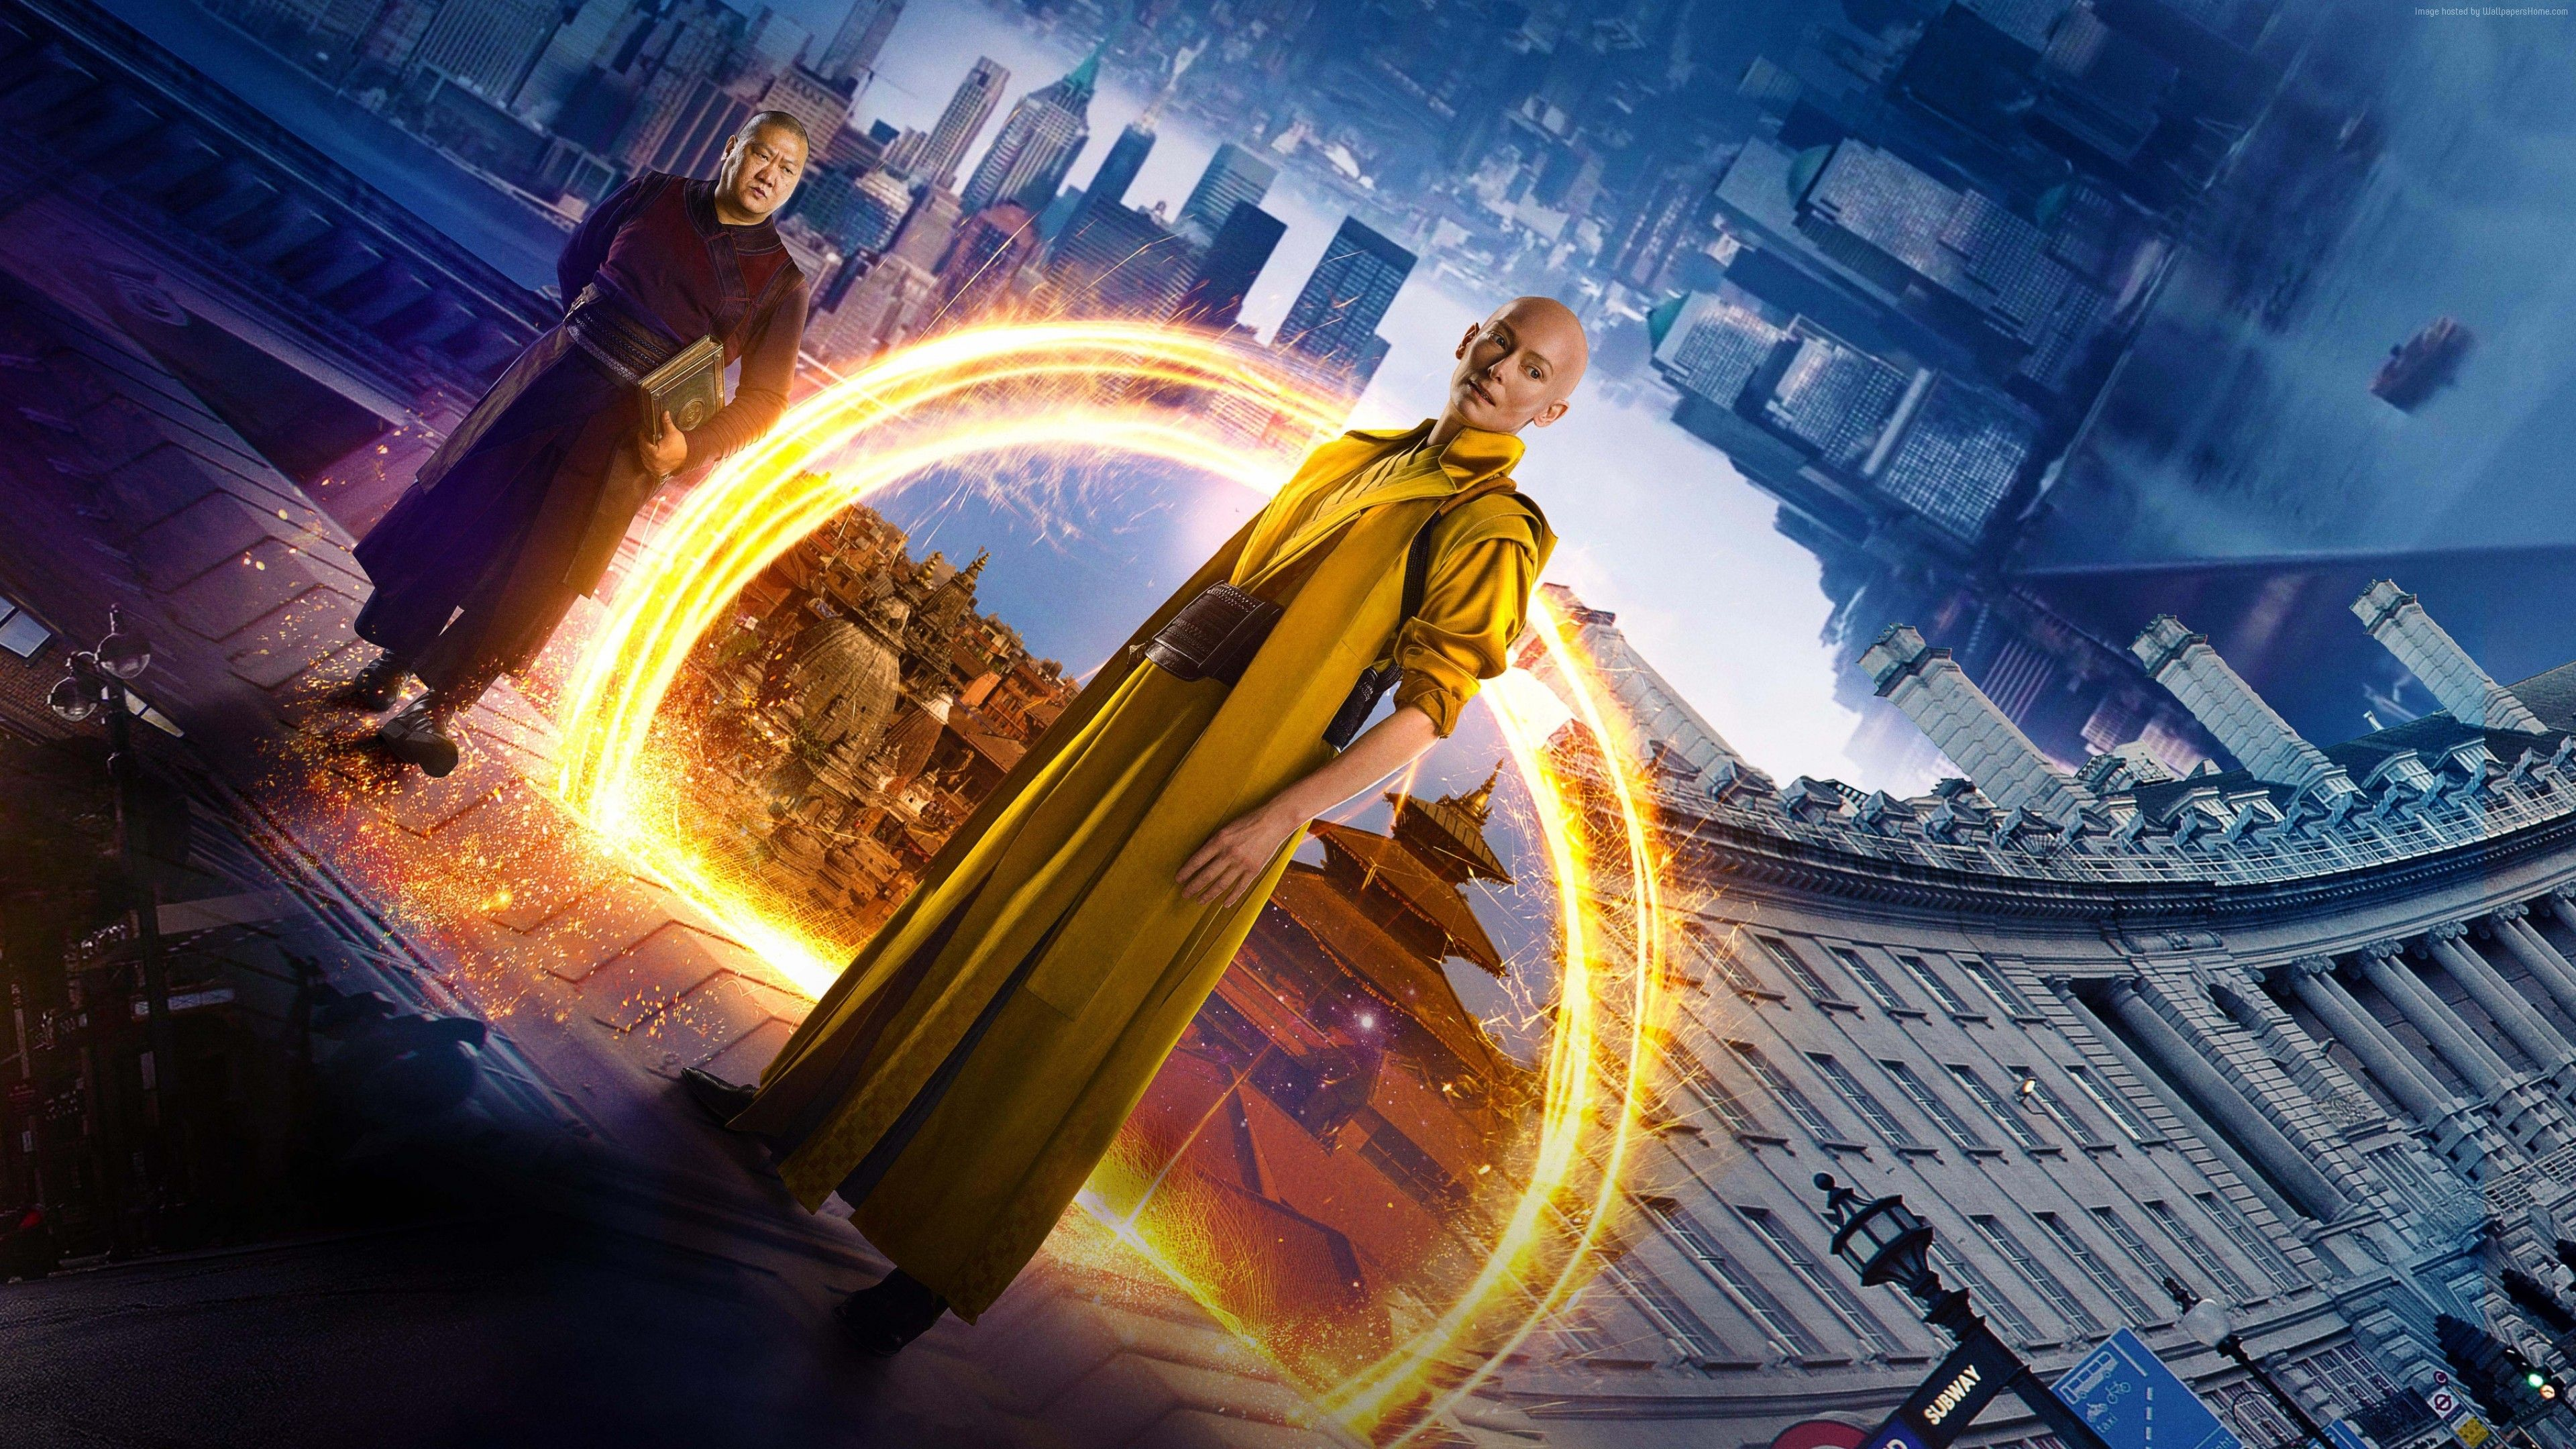 Tilda Swinton The Ancient One Doctor Strange Hd Wallpaper -5872